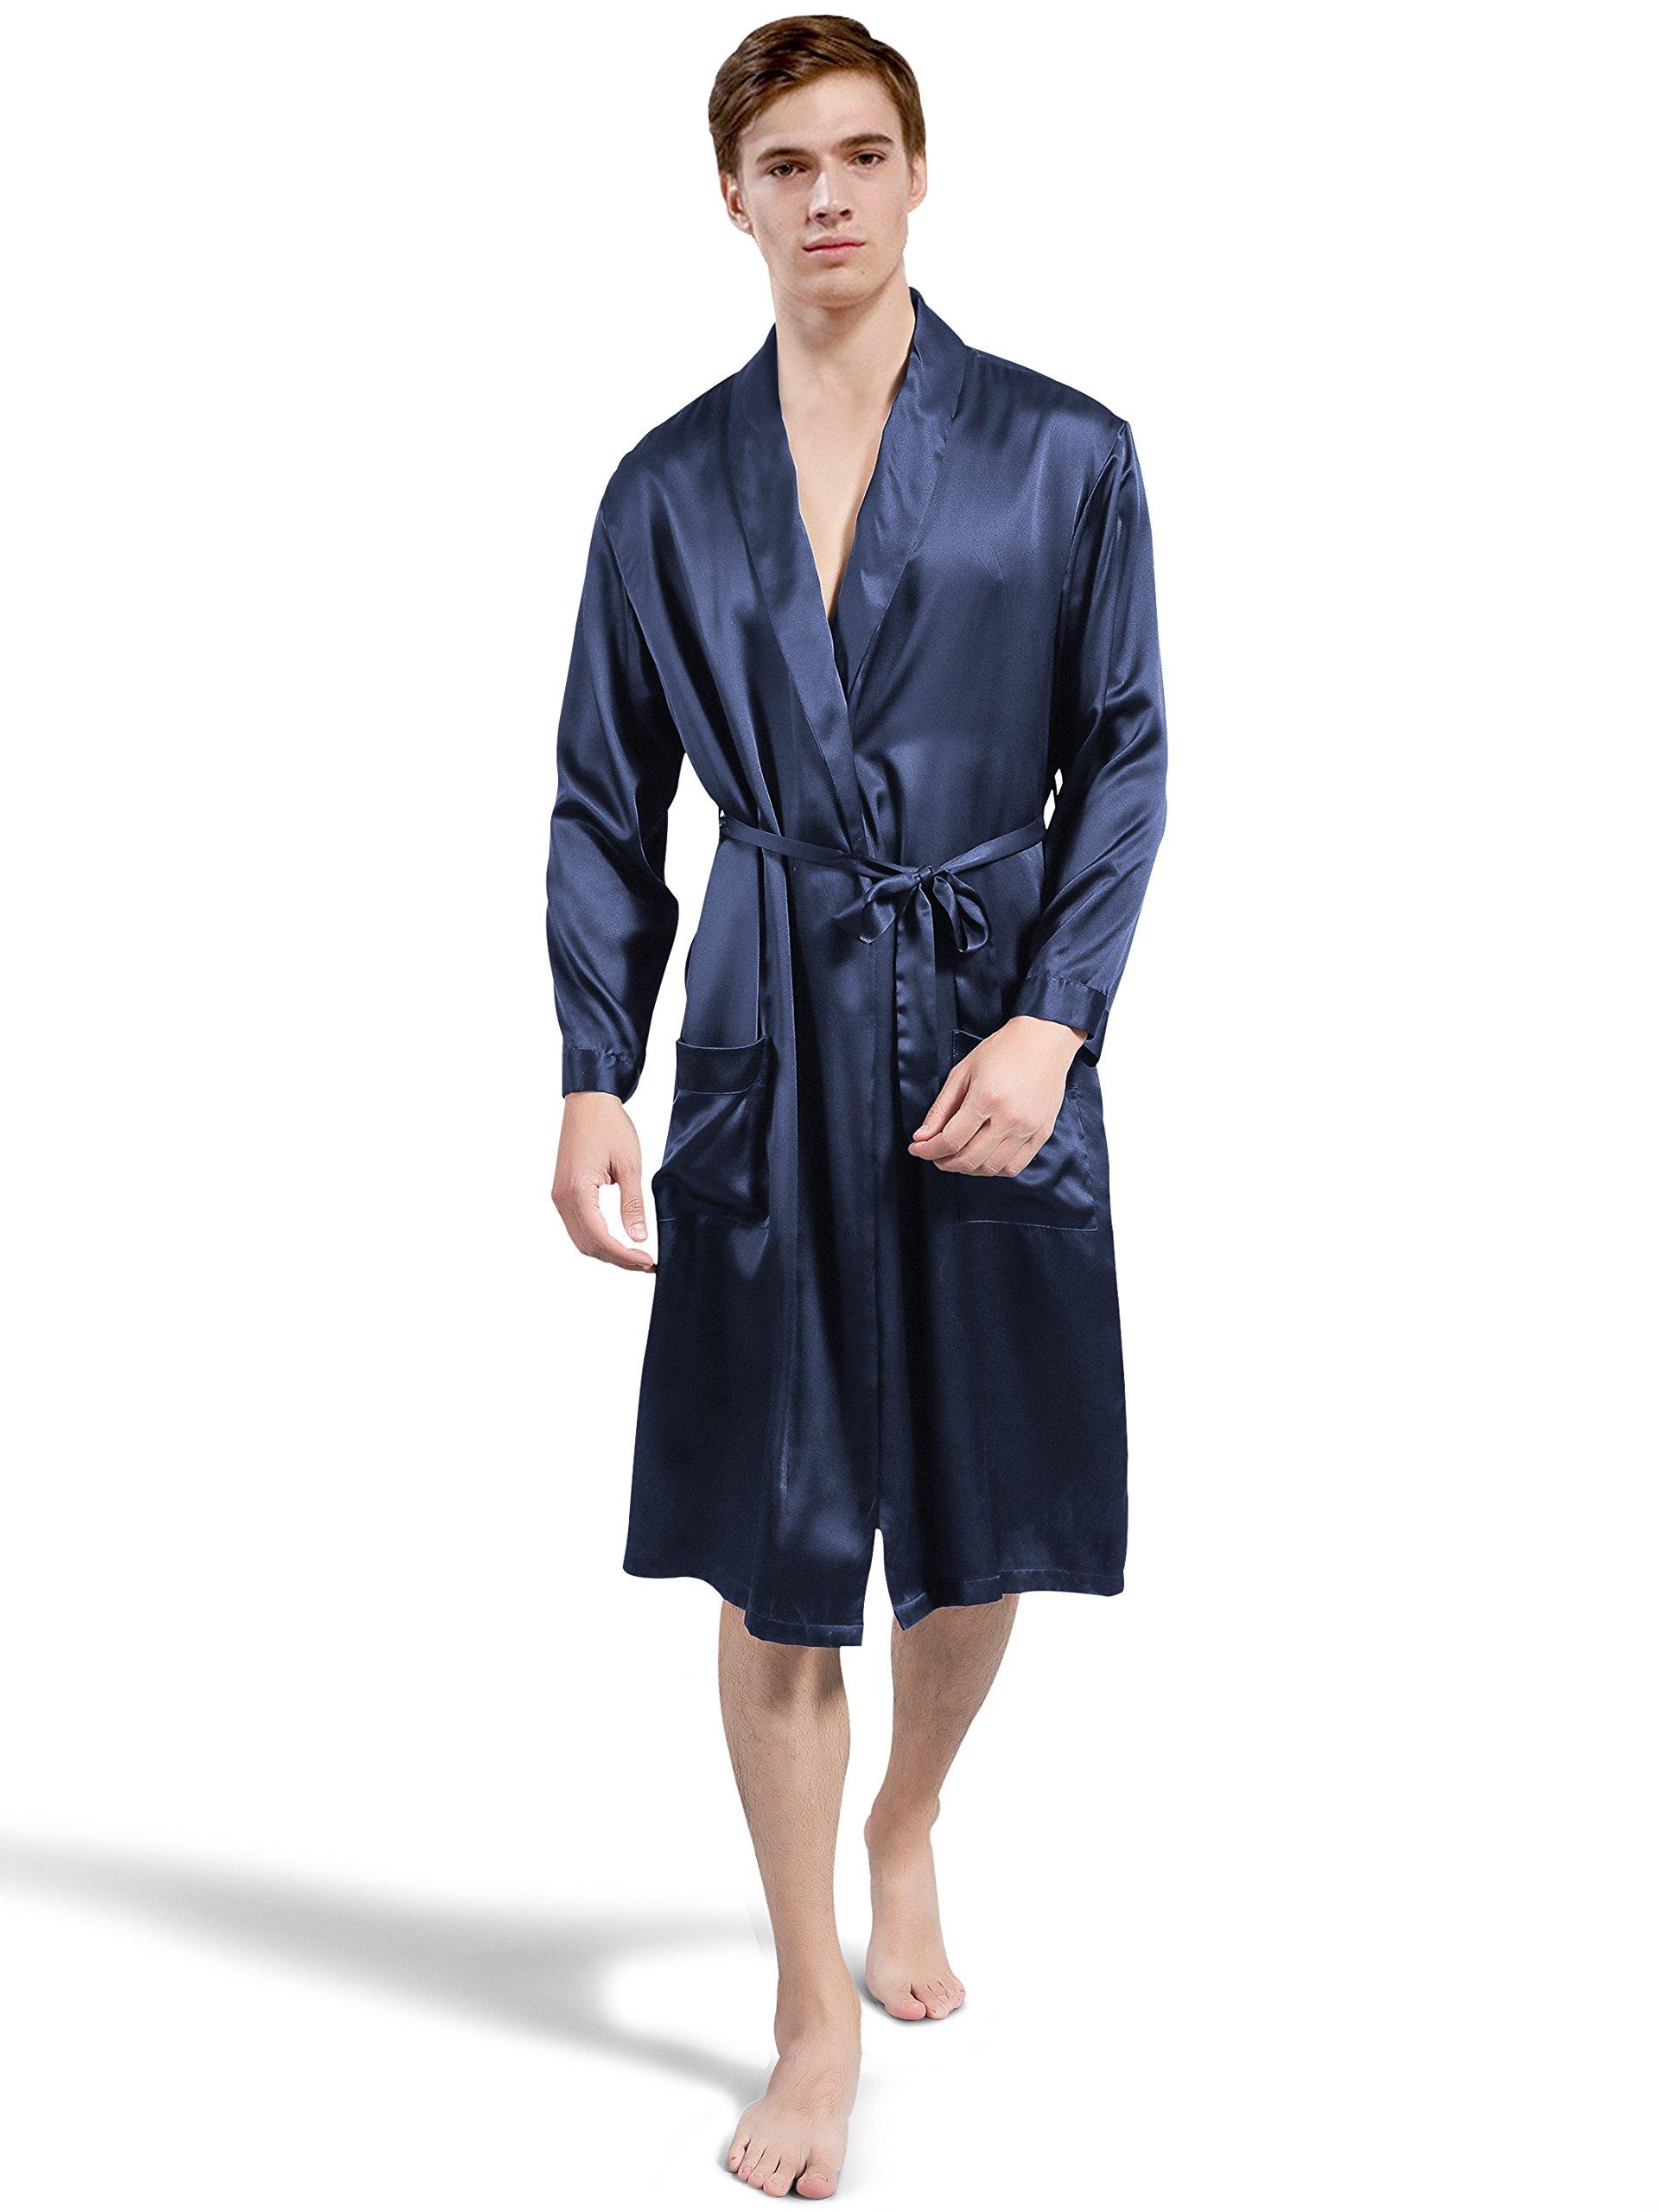 ElleSilk Men's Silk Robe, Silk Sleepwear For Men, 22 Momme 100% Mulberry Silk, Navy, M